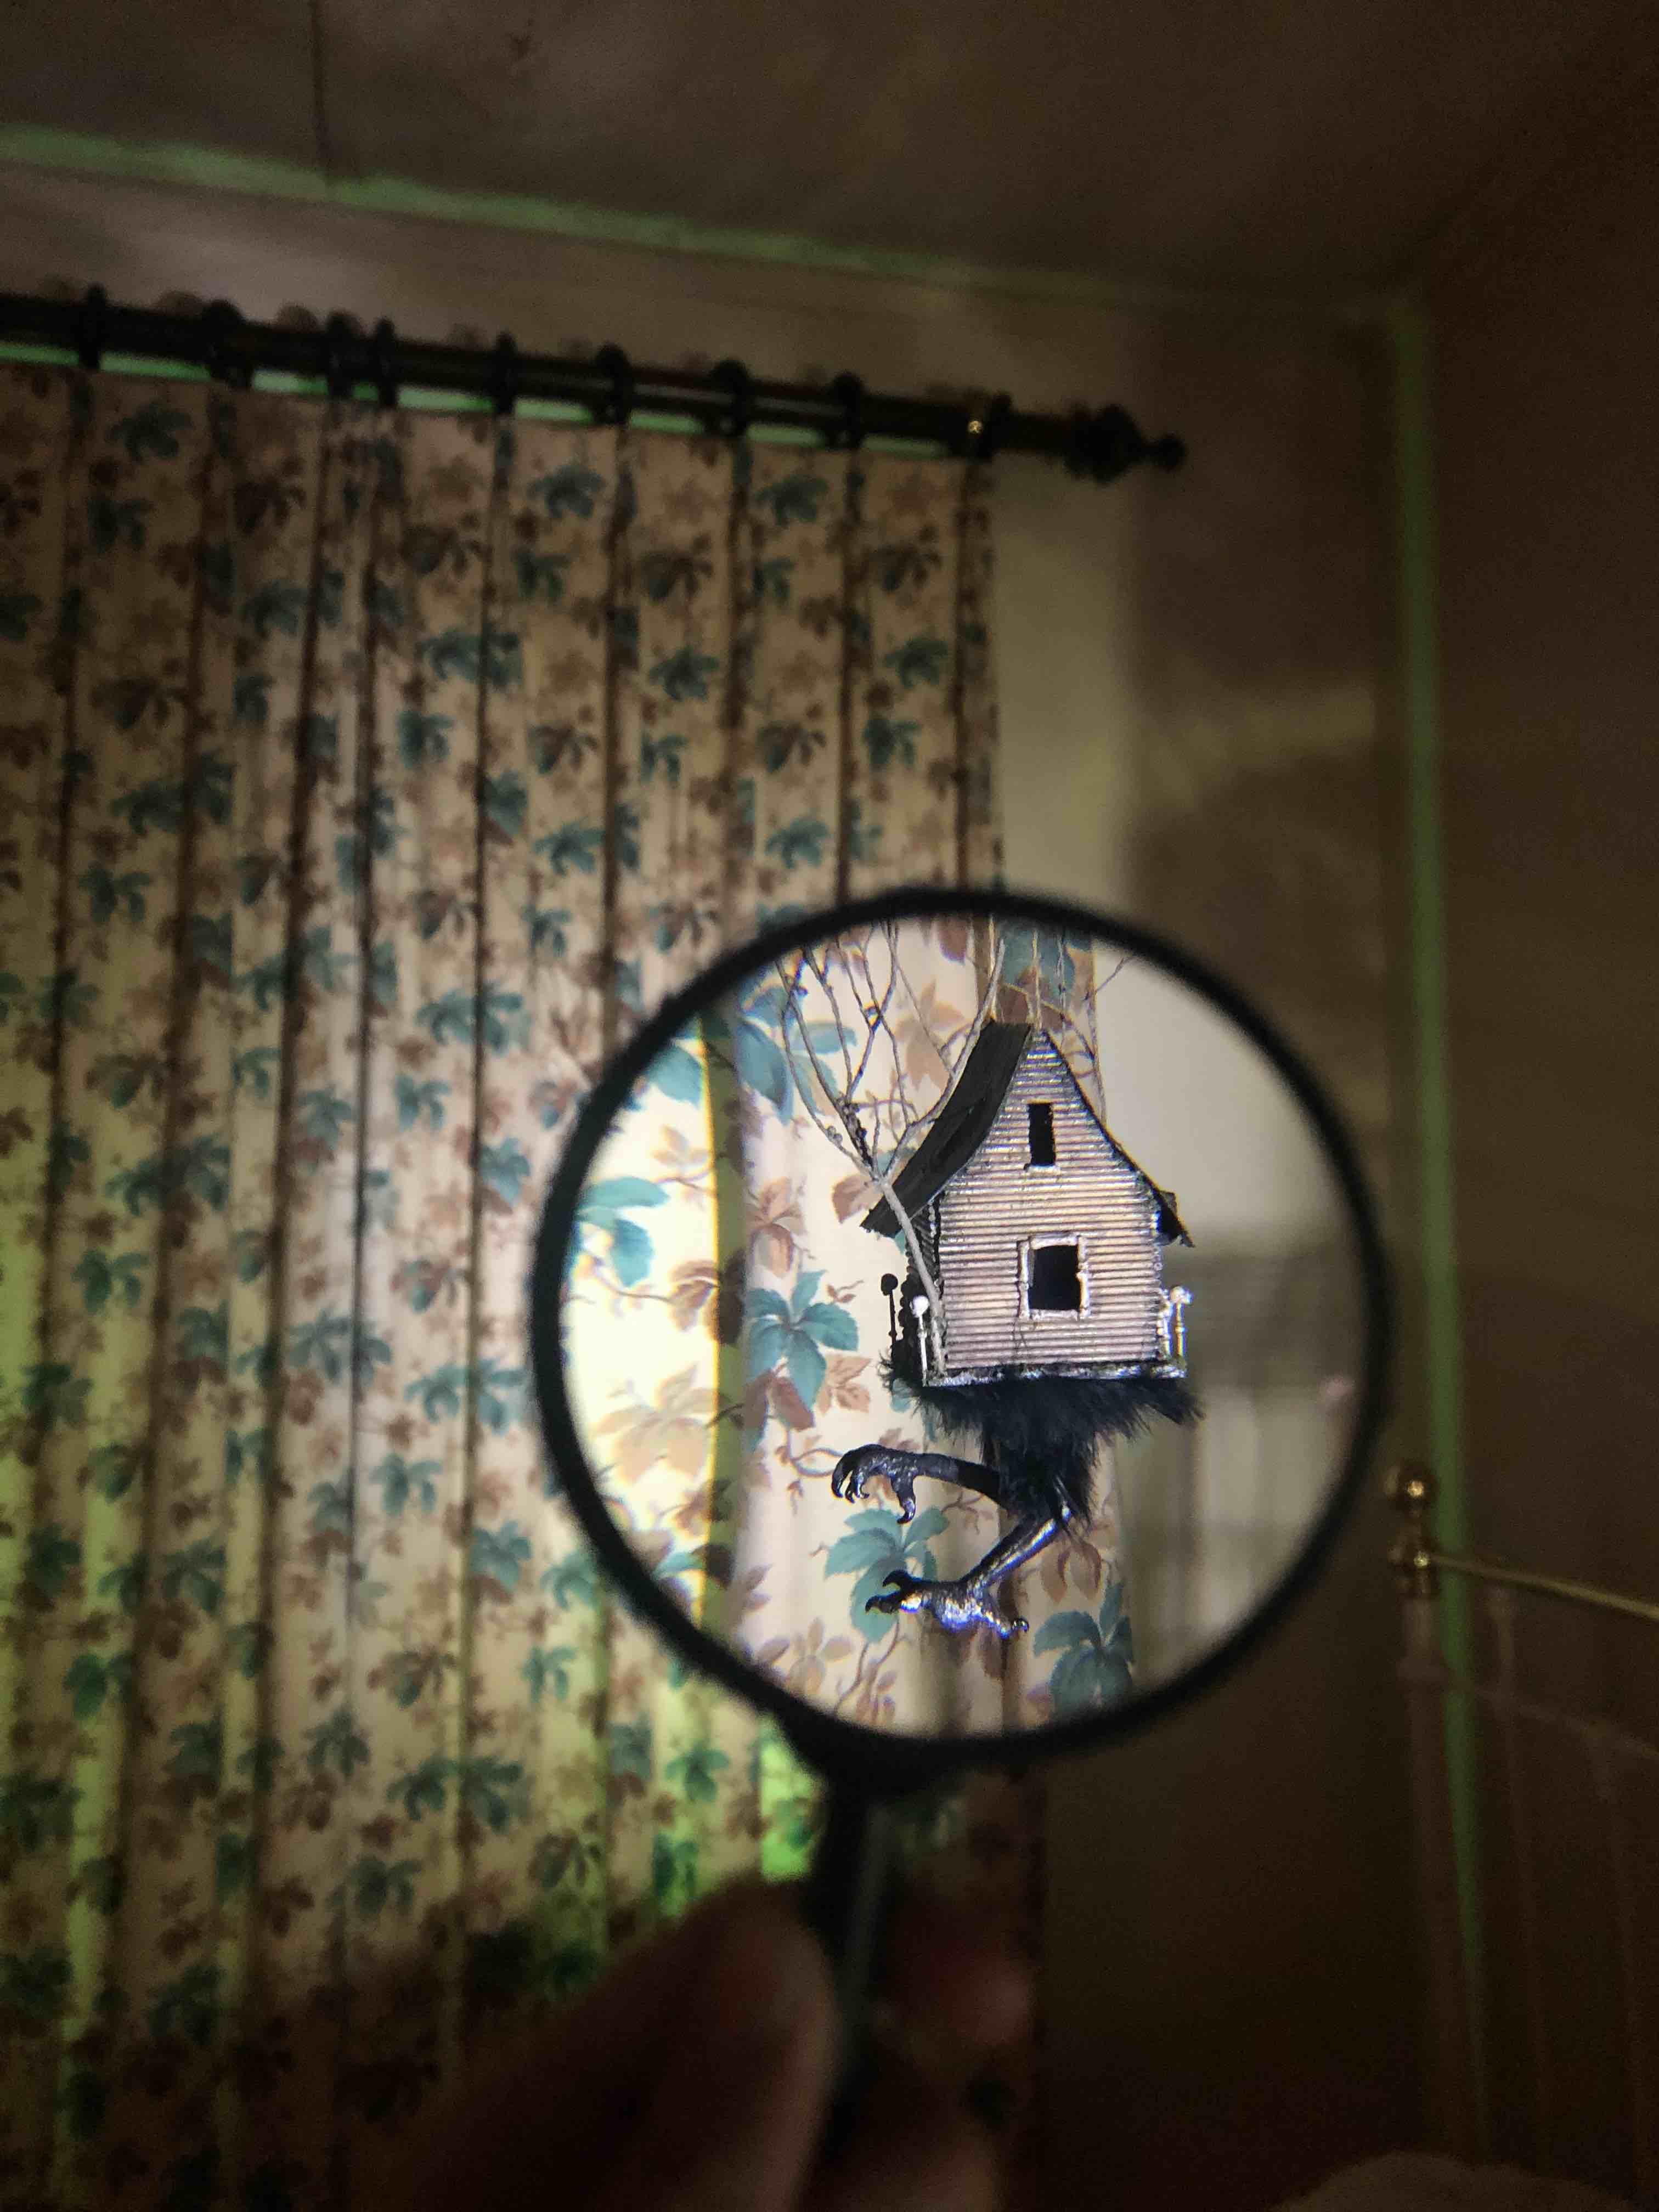 Tarryn Handcock, Baba Yaga's Hut (2021), shown at Doll House: Miniature Worlds of Wonder, Como House.